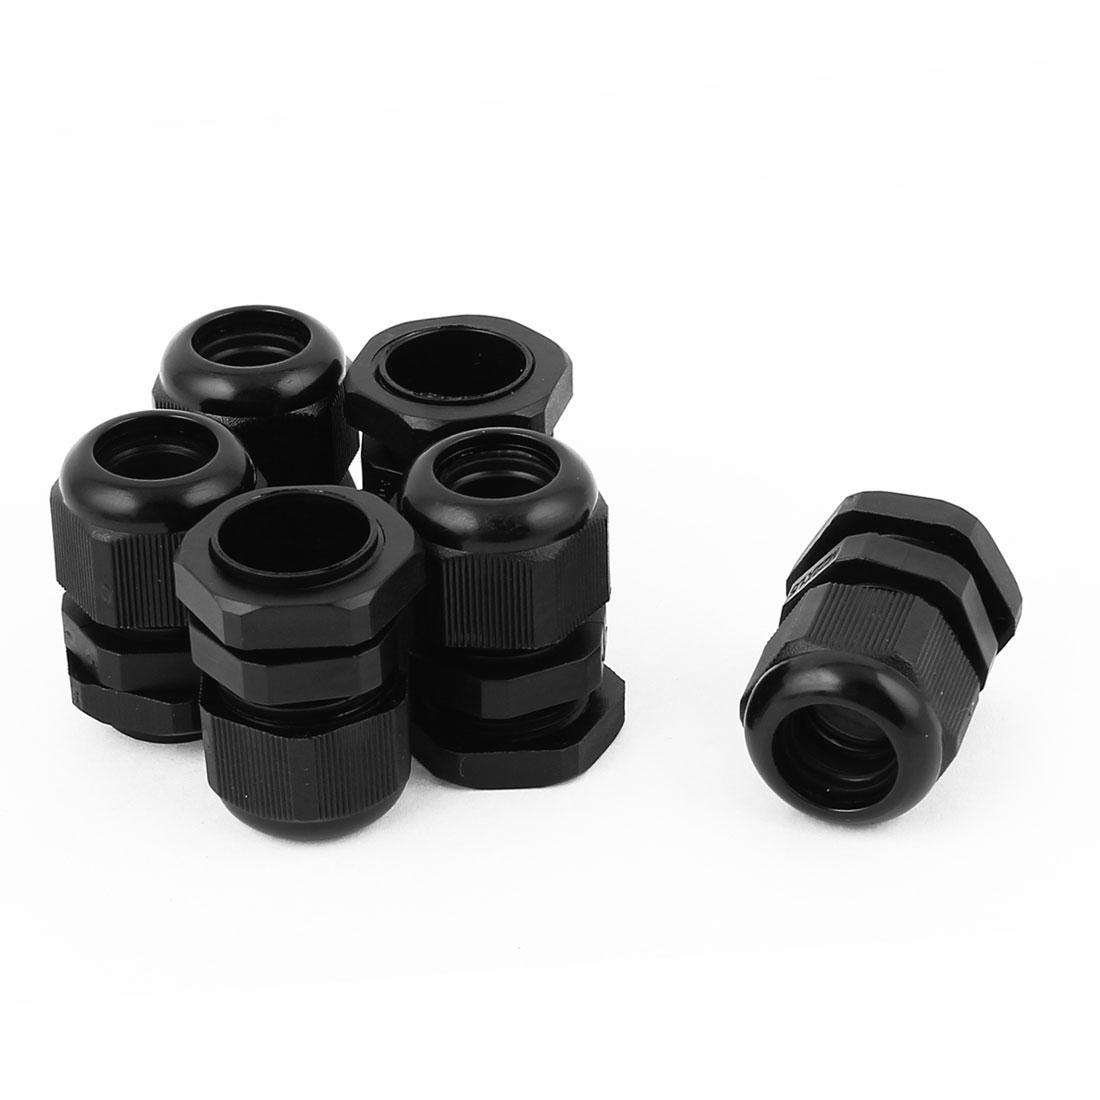 6 Pcs M22 10-14mm Waterproof Compression Cable Glands Locknut M22x1.5